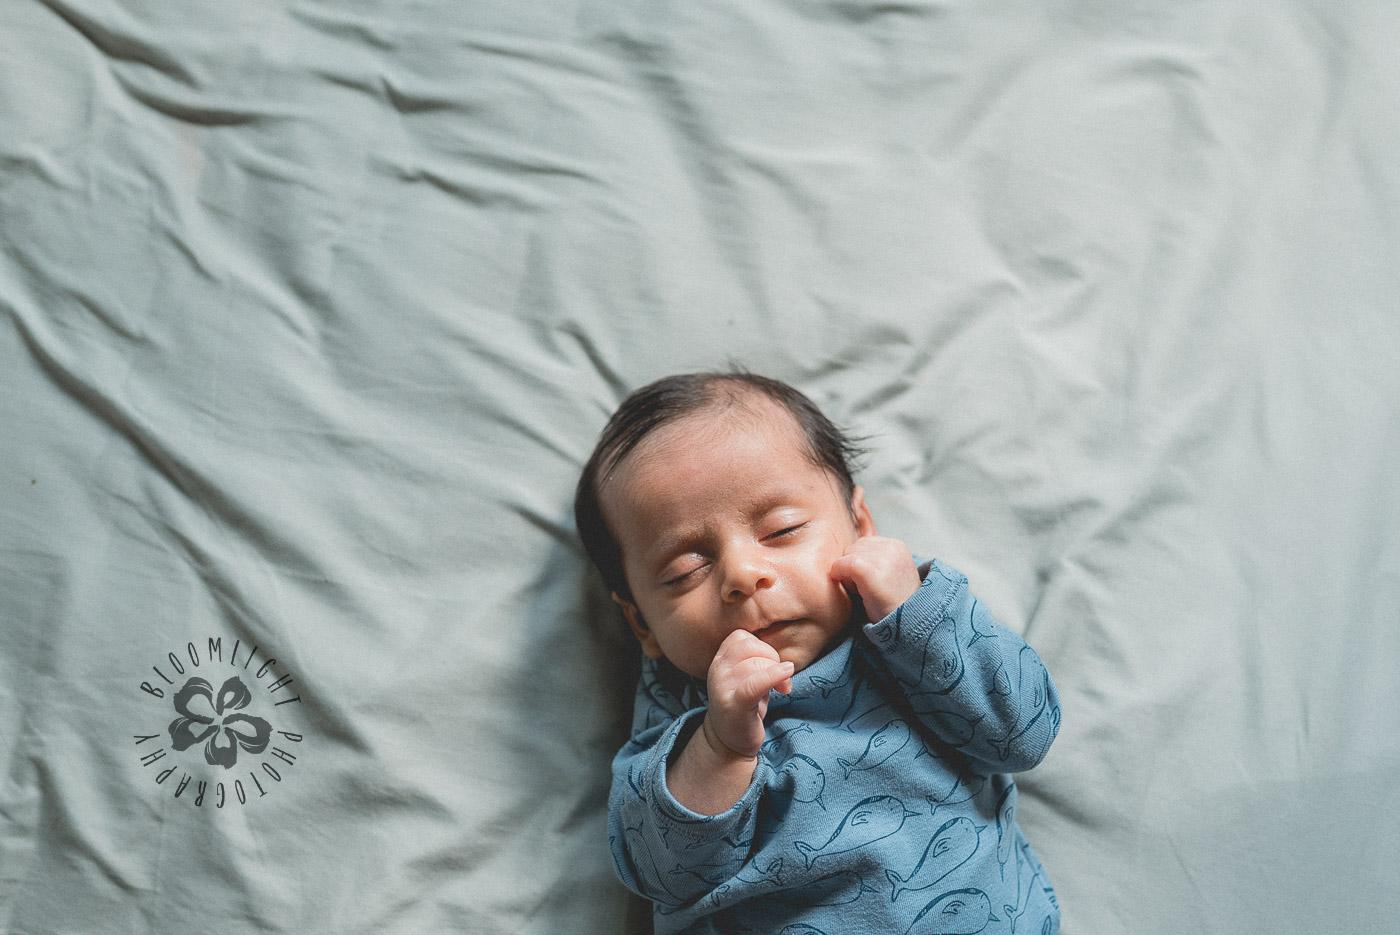 Toronto and northyork newborn ln home photography 7